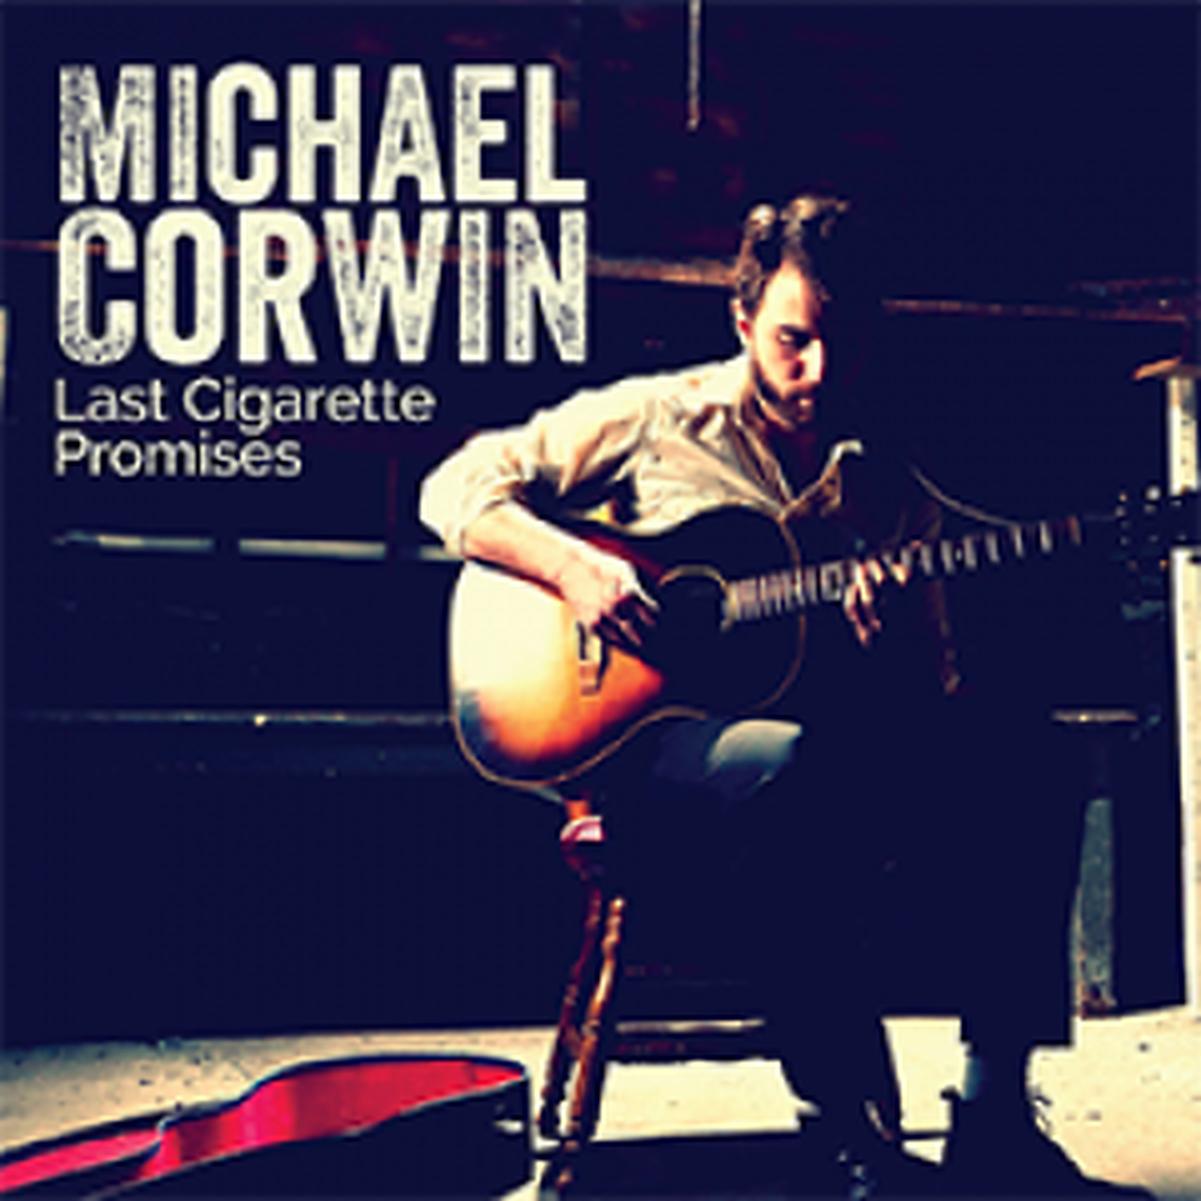 Michael Corwin